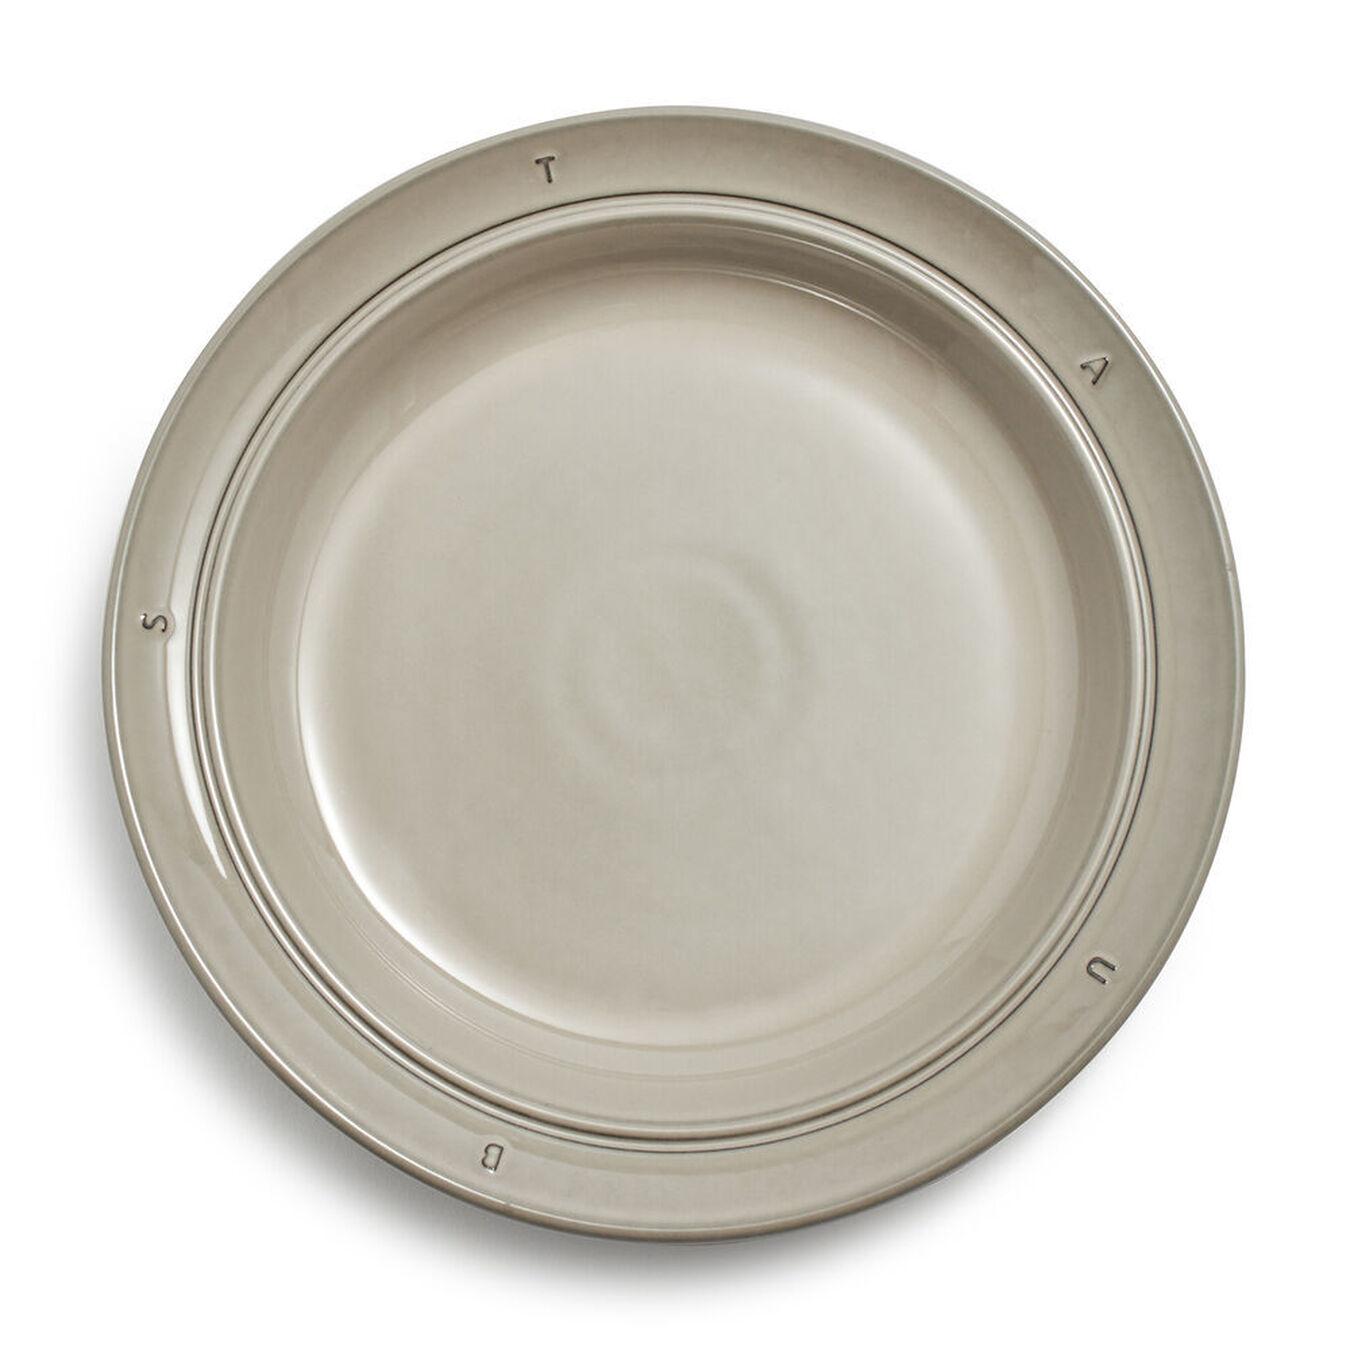 Serving set, 12 Piece | graphite-grey | ceramic,,large 3